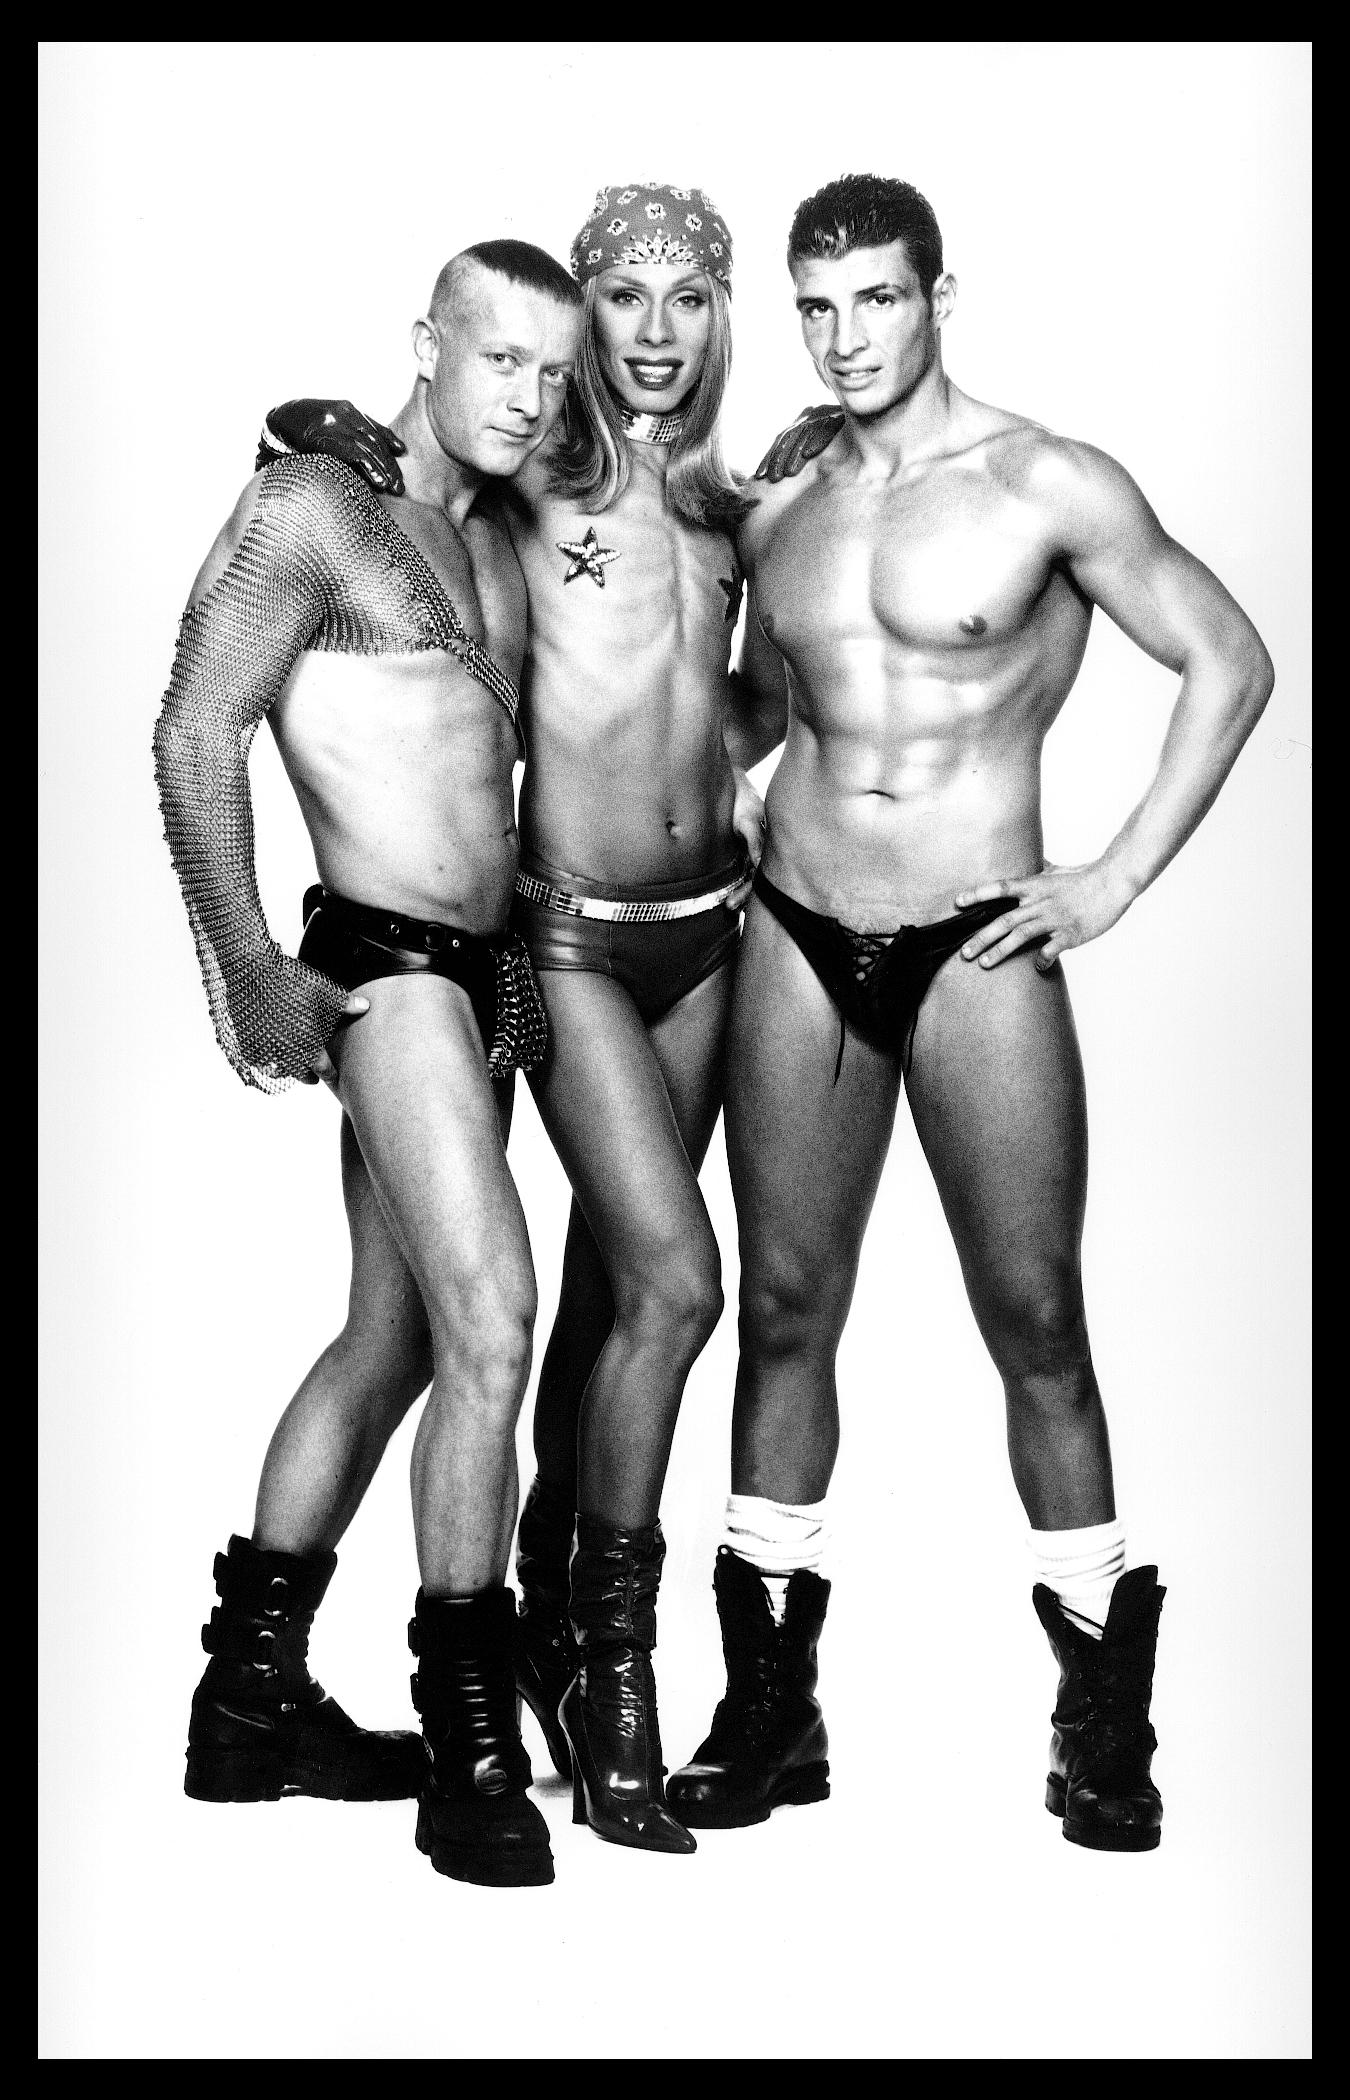 Tony_Ward_Wasteland_master_slave_relationships_bdsm_queer_gay